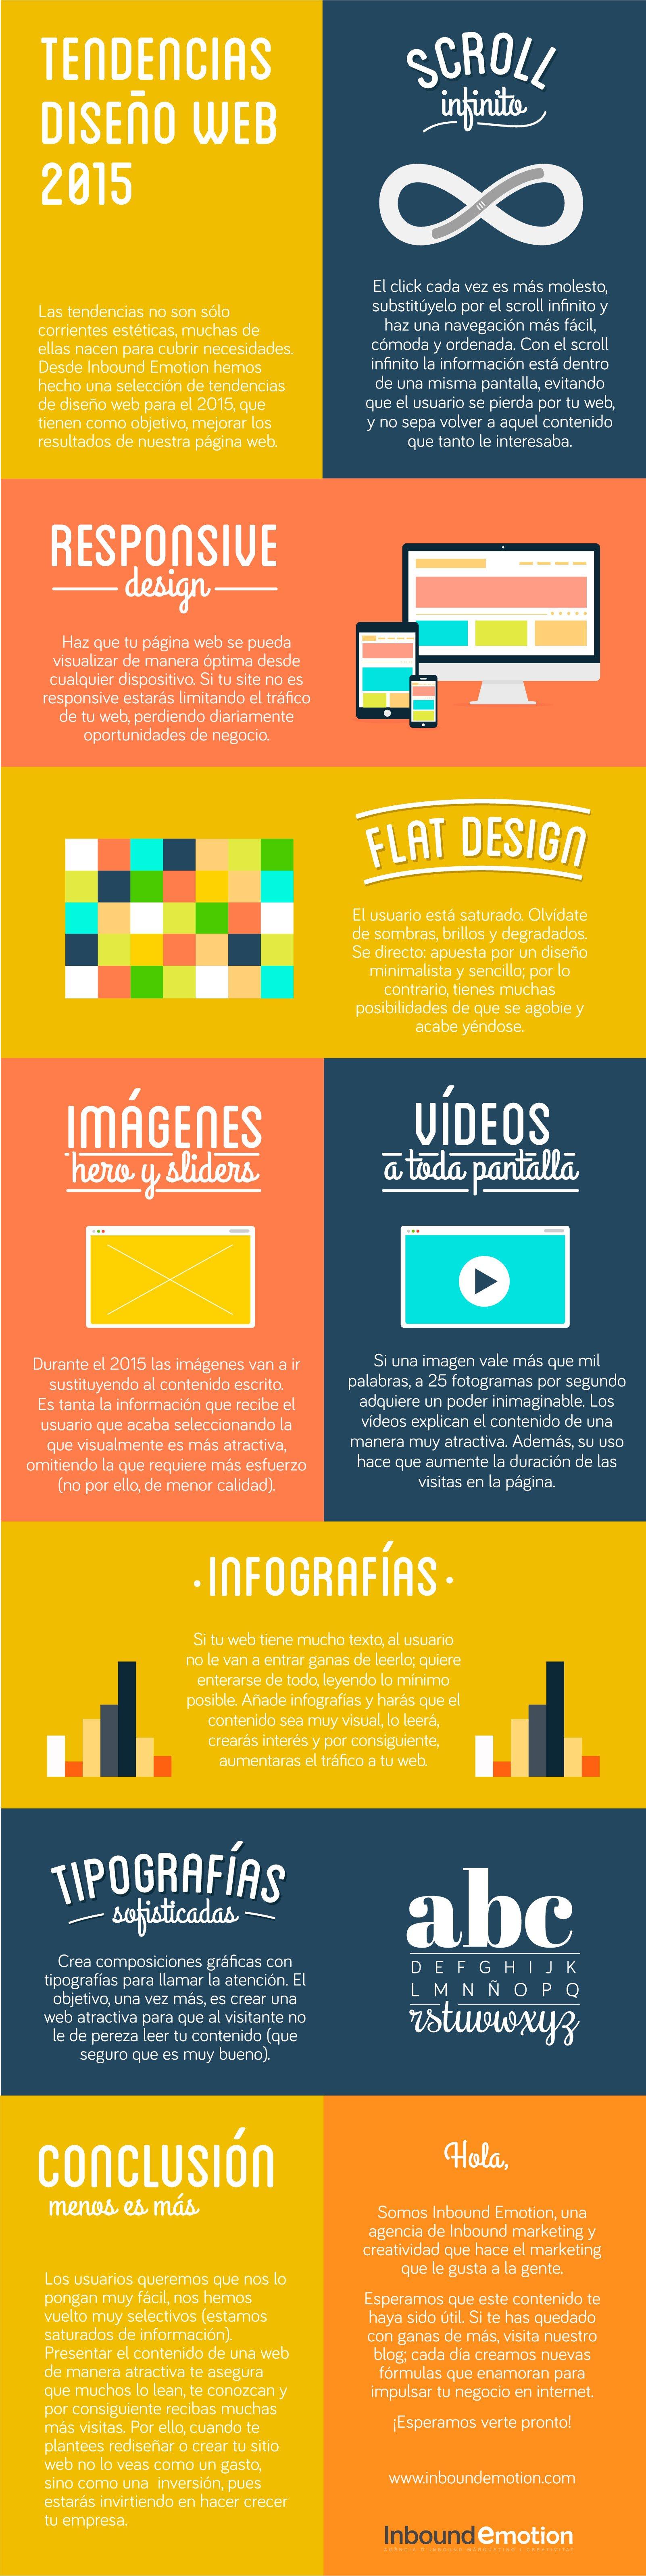 infografia-cast-tendencias-diseño-2015